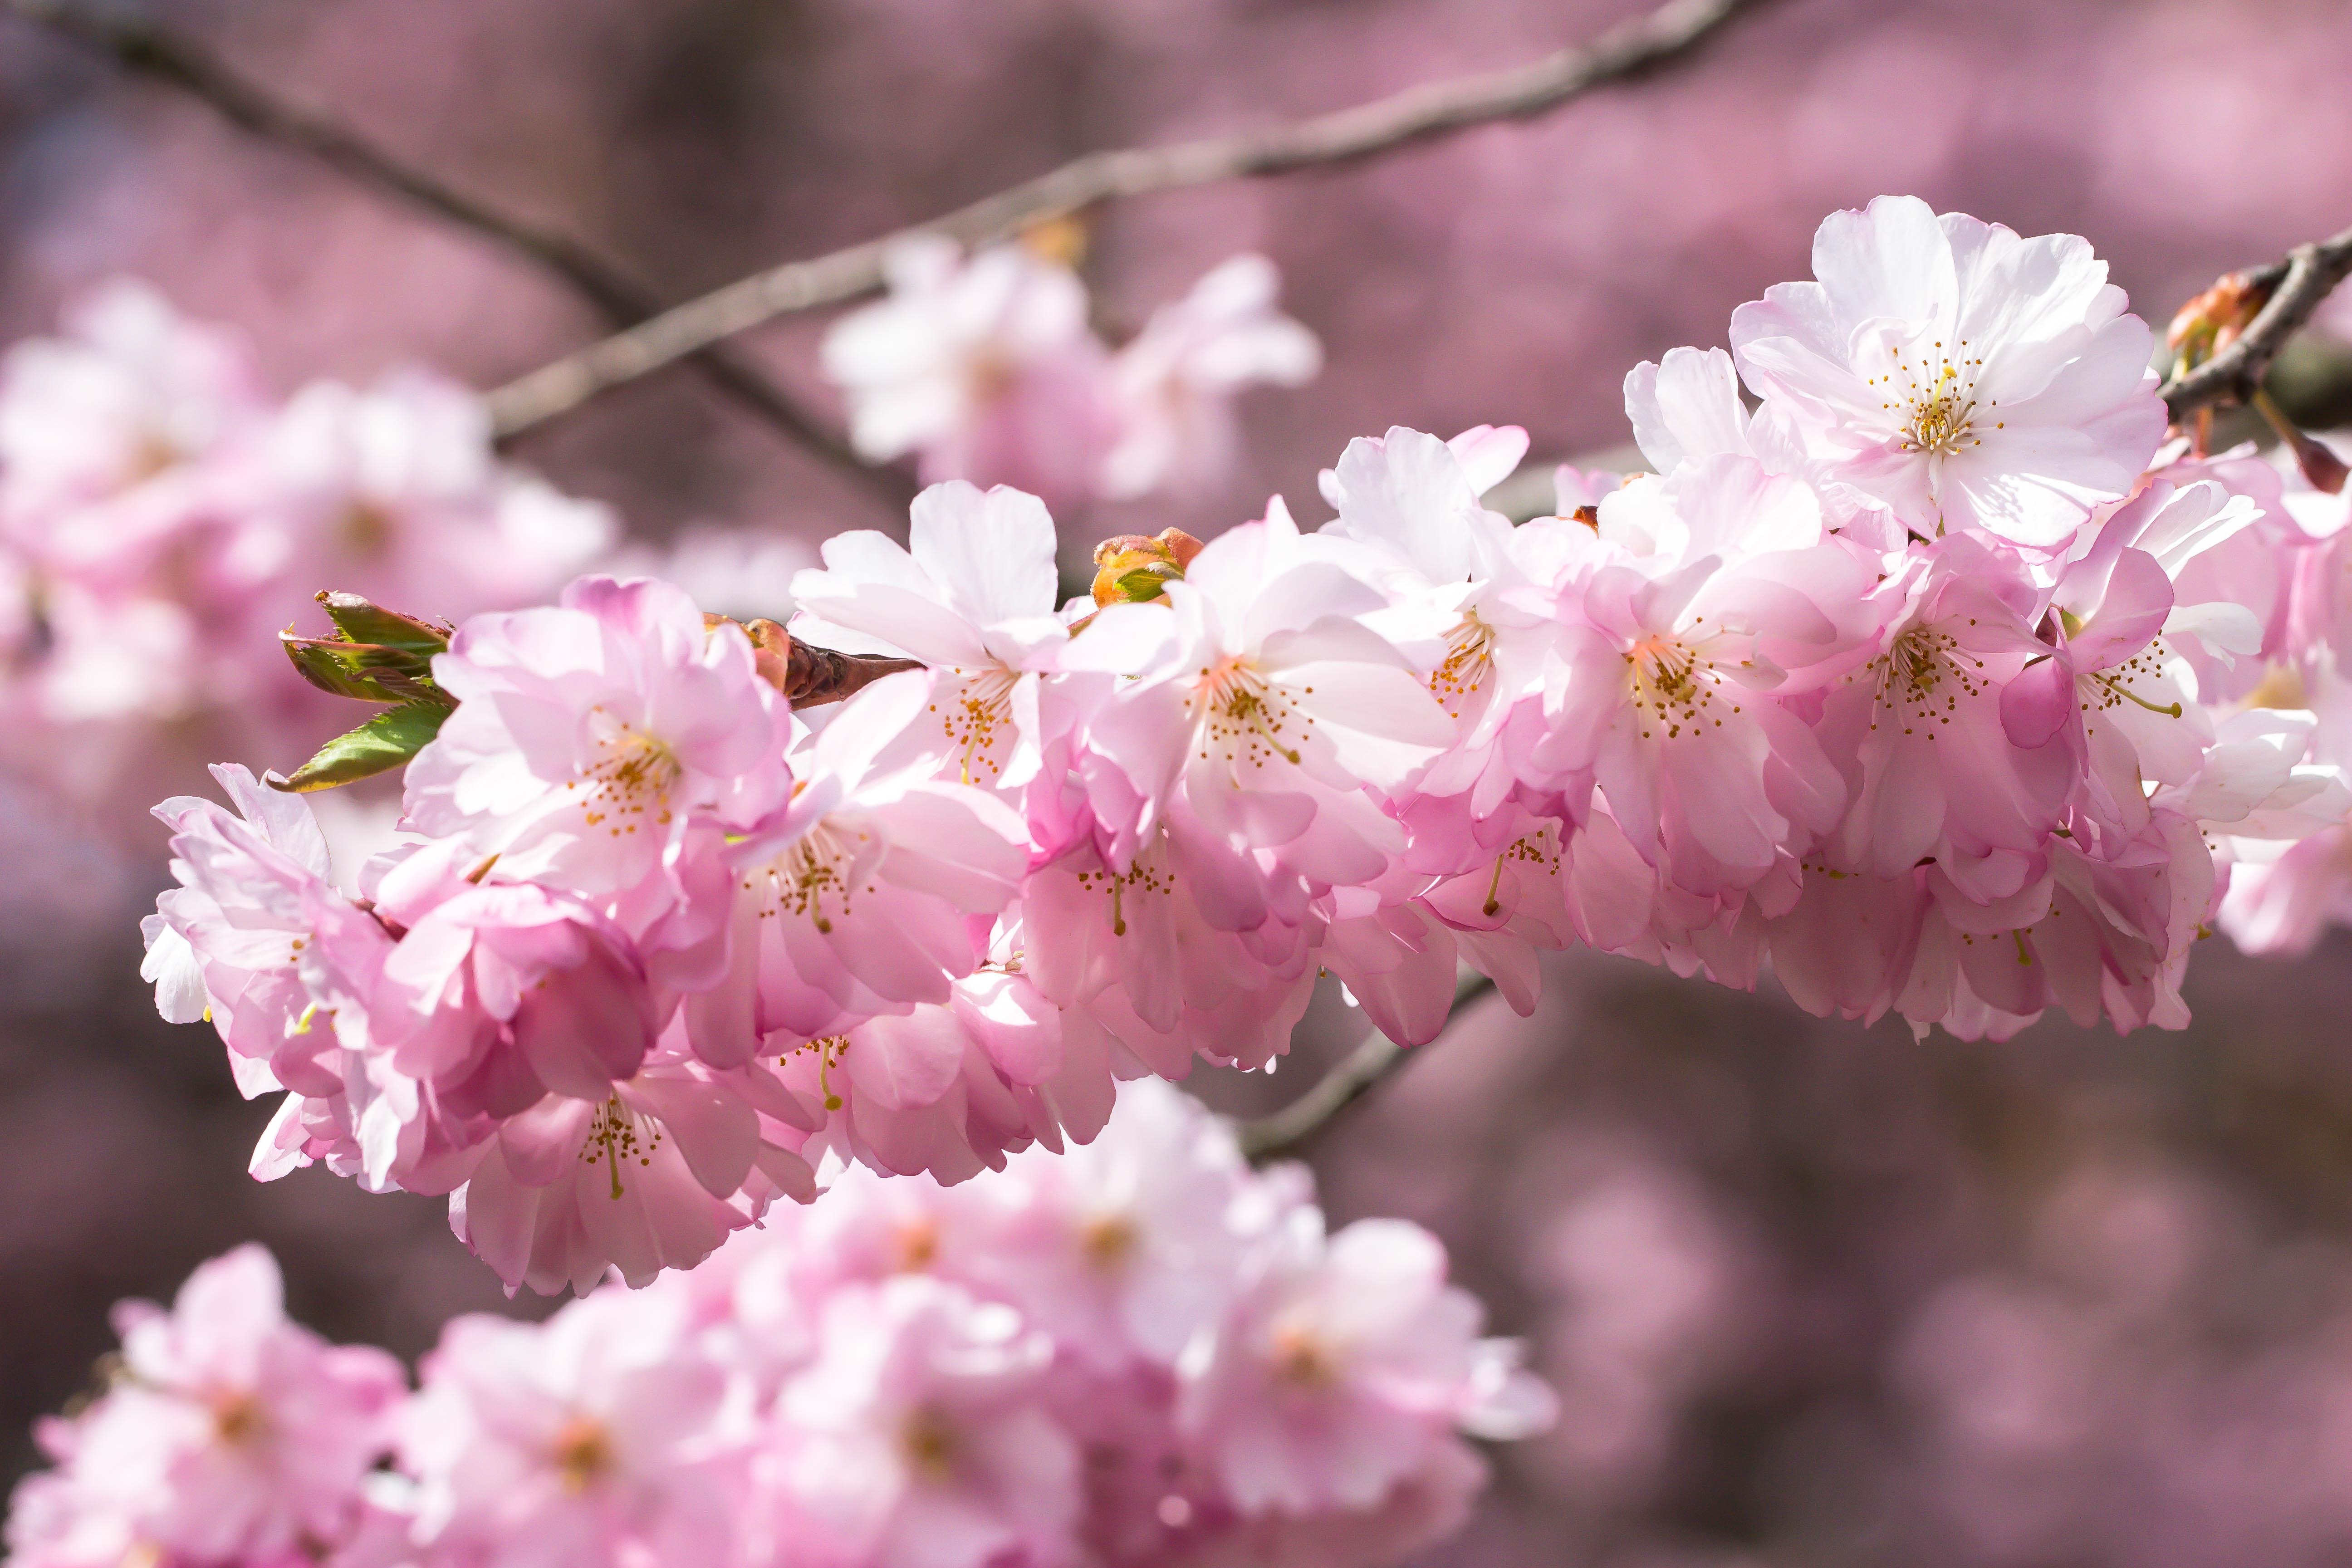 wallpaper makanan taman cabang buah bunga sakura mekar berwarna merah muda musim semi menanam ceri flora blomma v r alnarp daun bunga